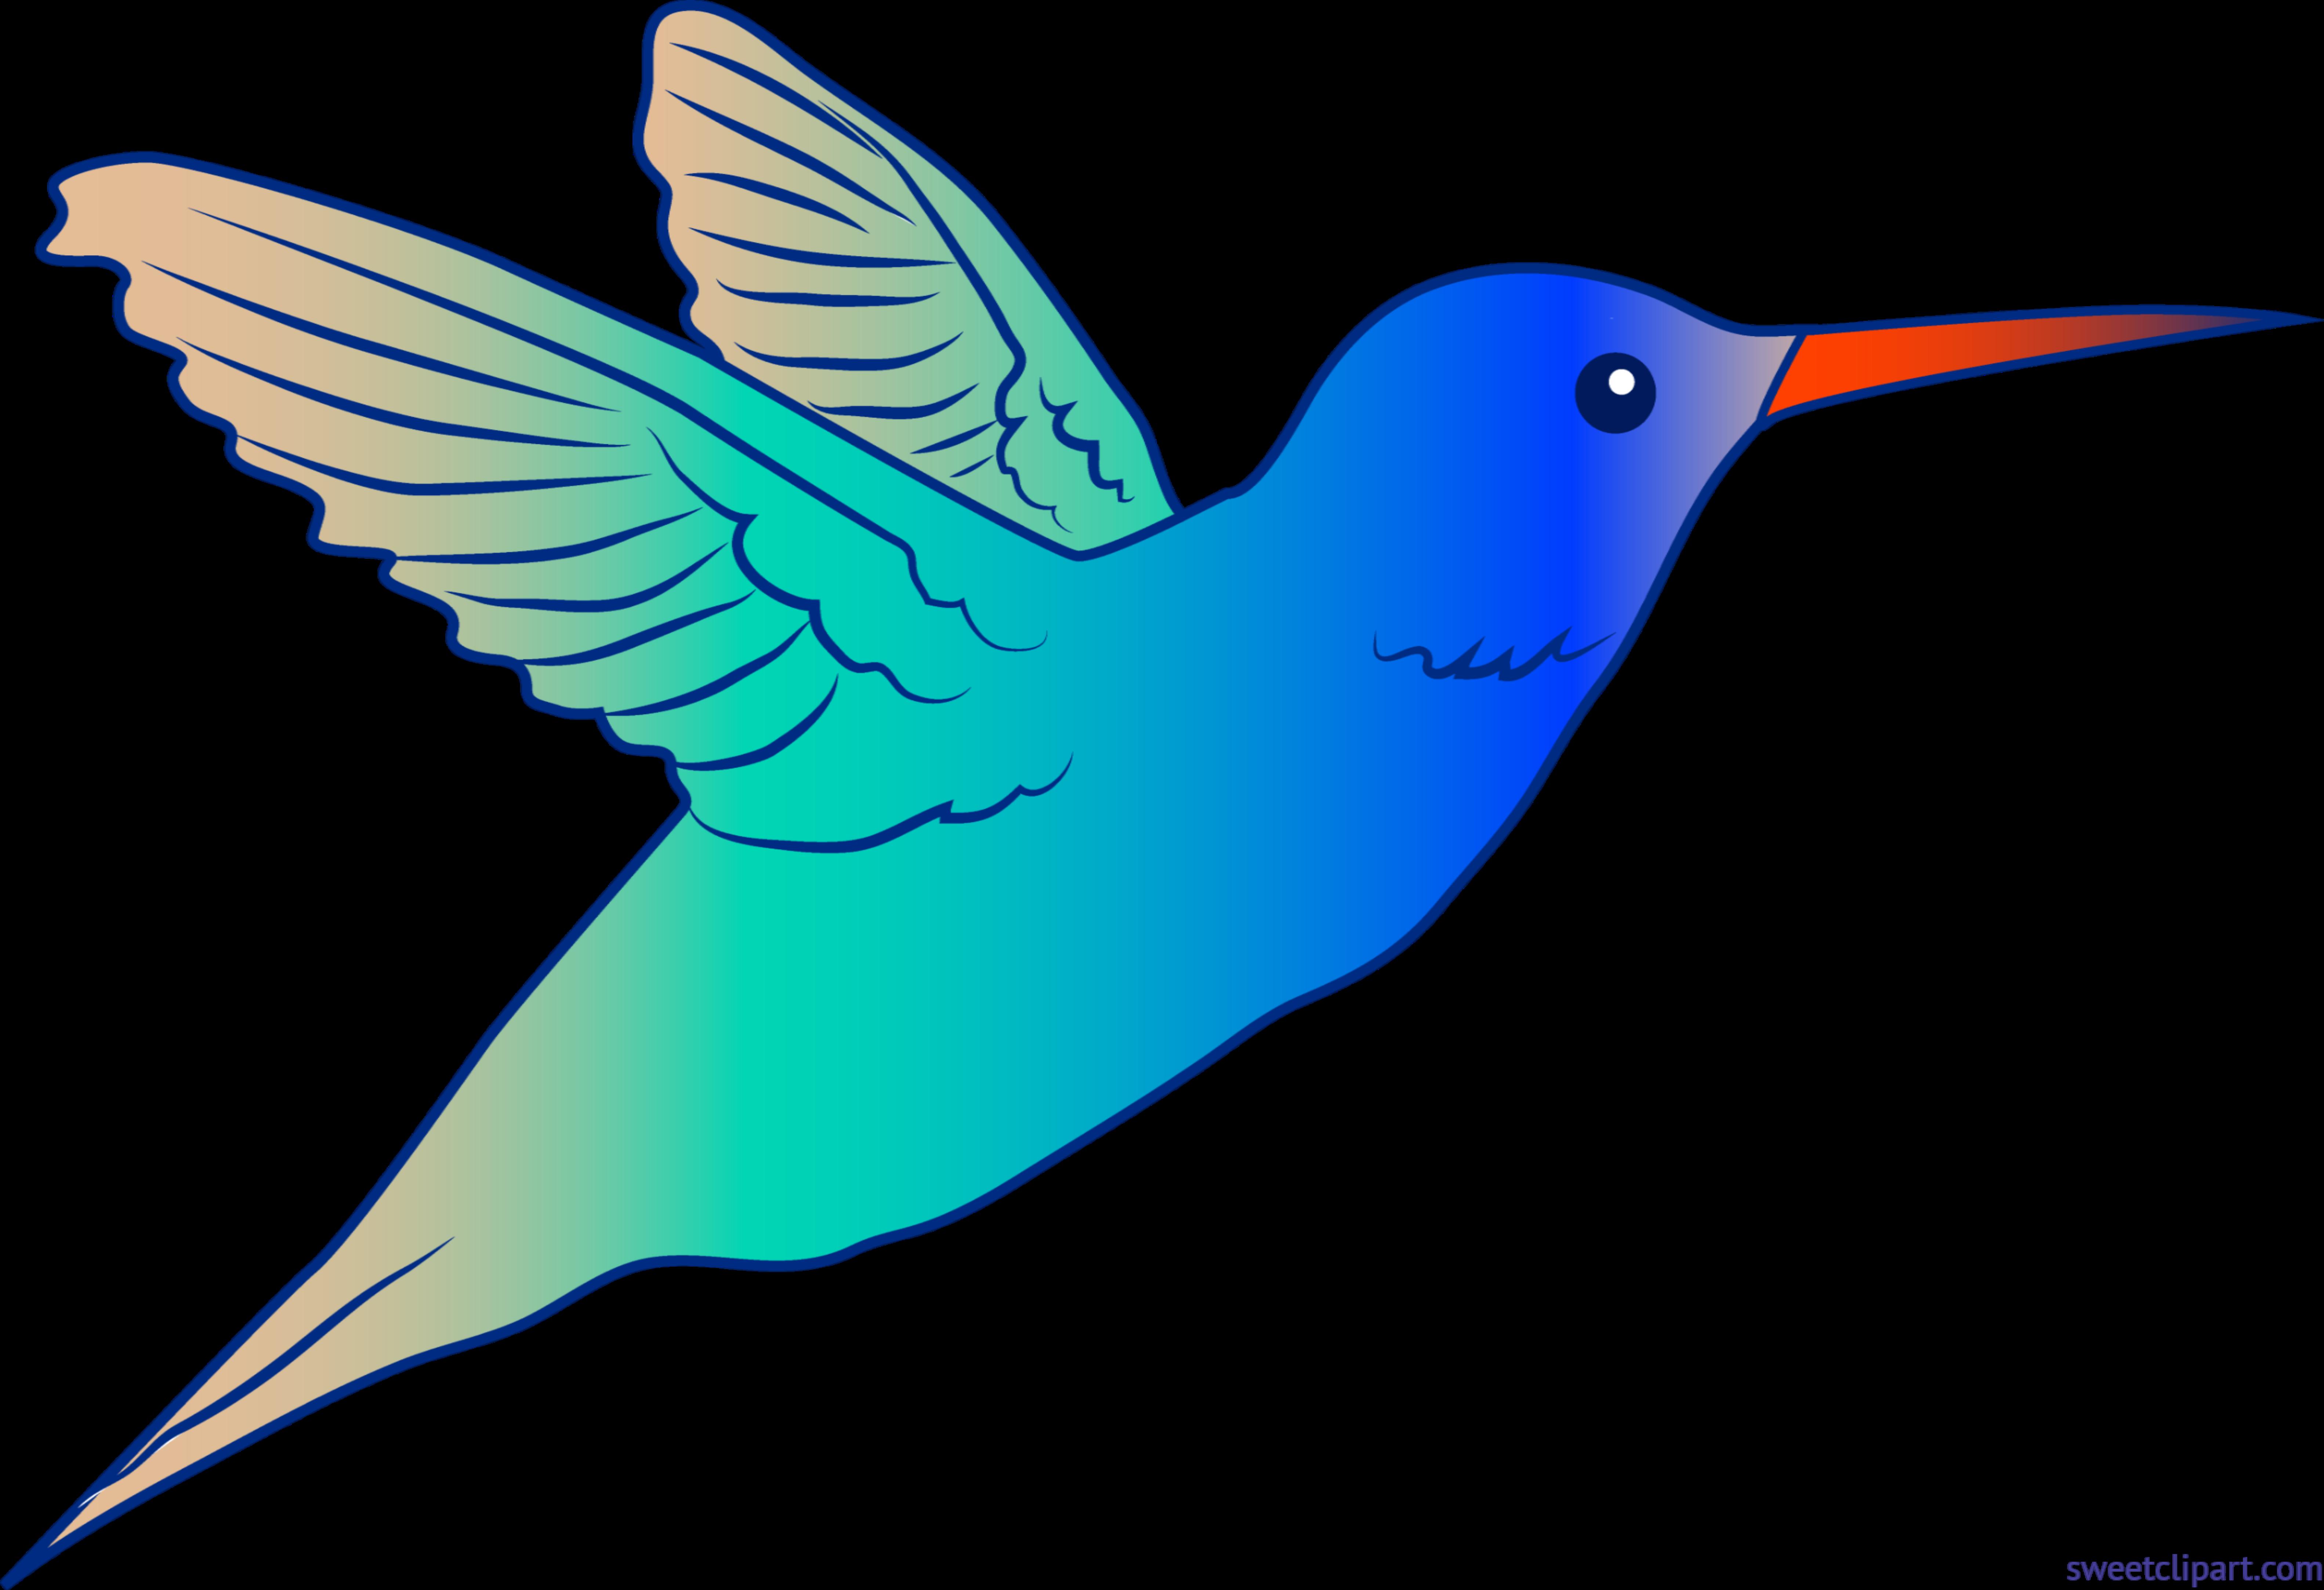 Clip art sweet. Hummingbird clipart real